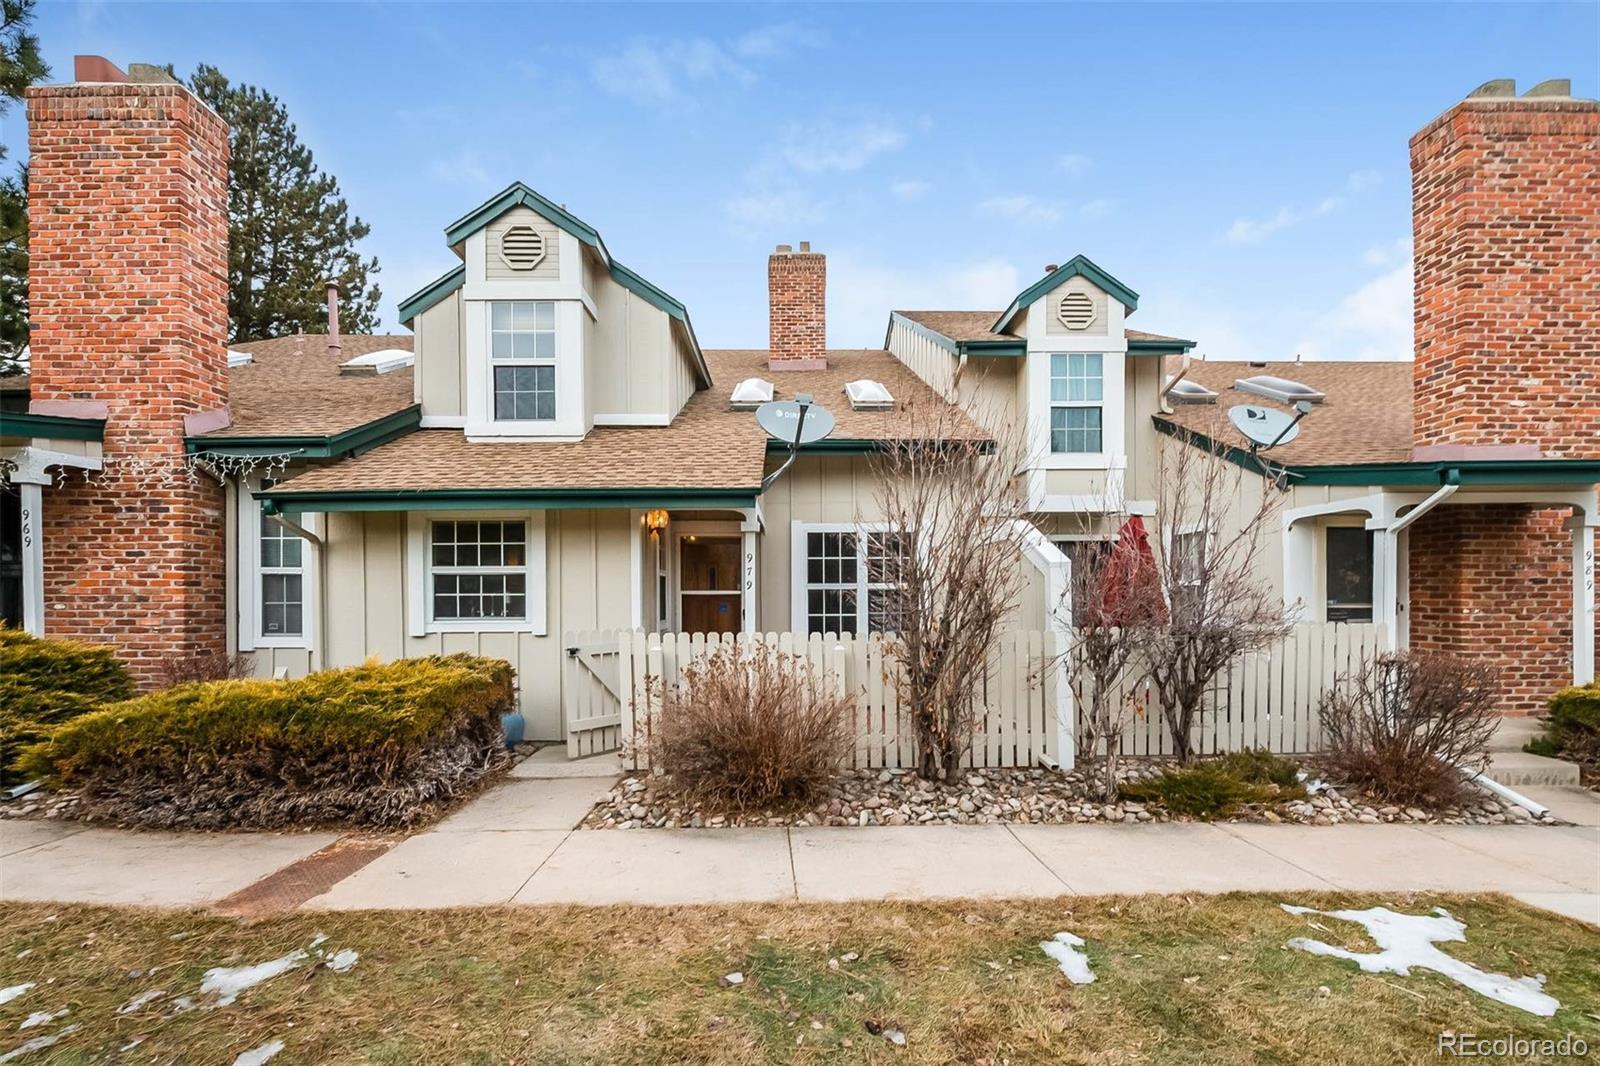 979 S Granby Way, Aurora, CO 80012 - Aurora, CO real estate listing